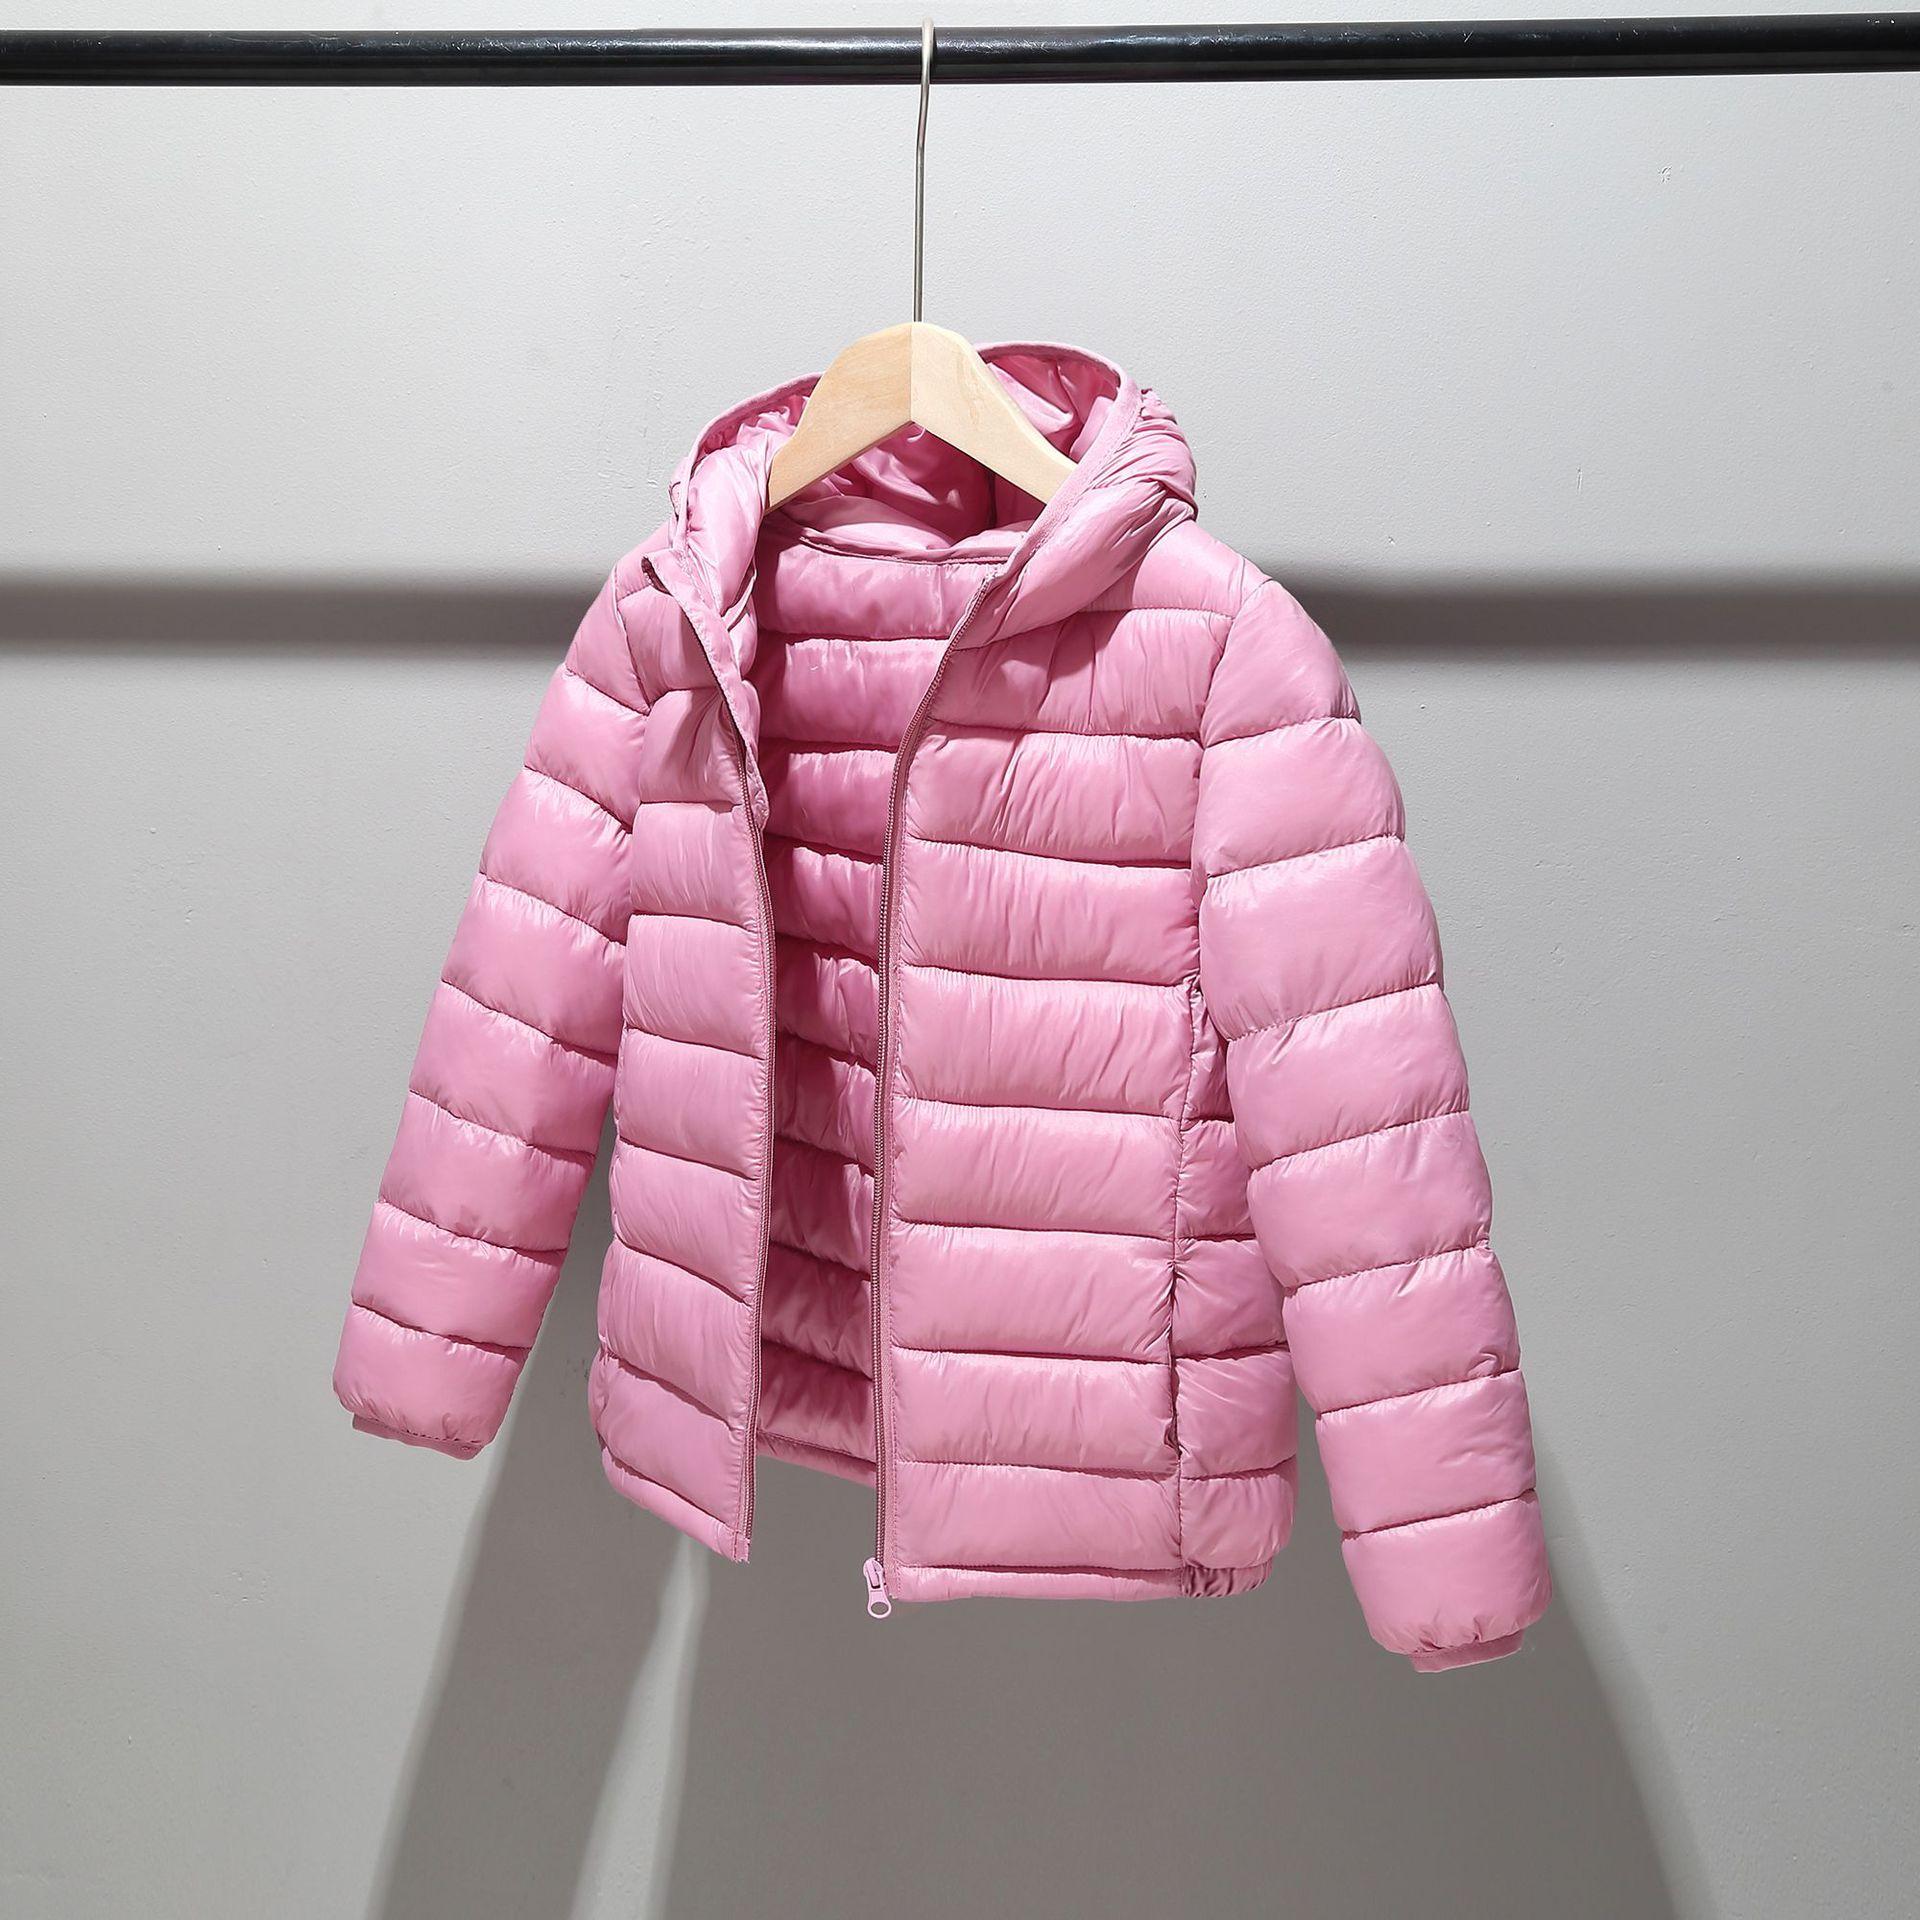 Winter Down Cotton Jacket Boy Girl Hooded Outerwear Coat Boys Snowsuit Kid Ultra Light Coat Children